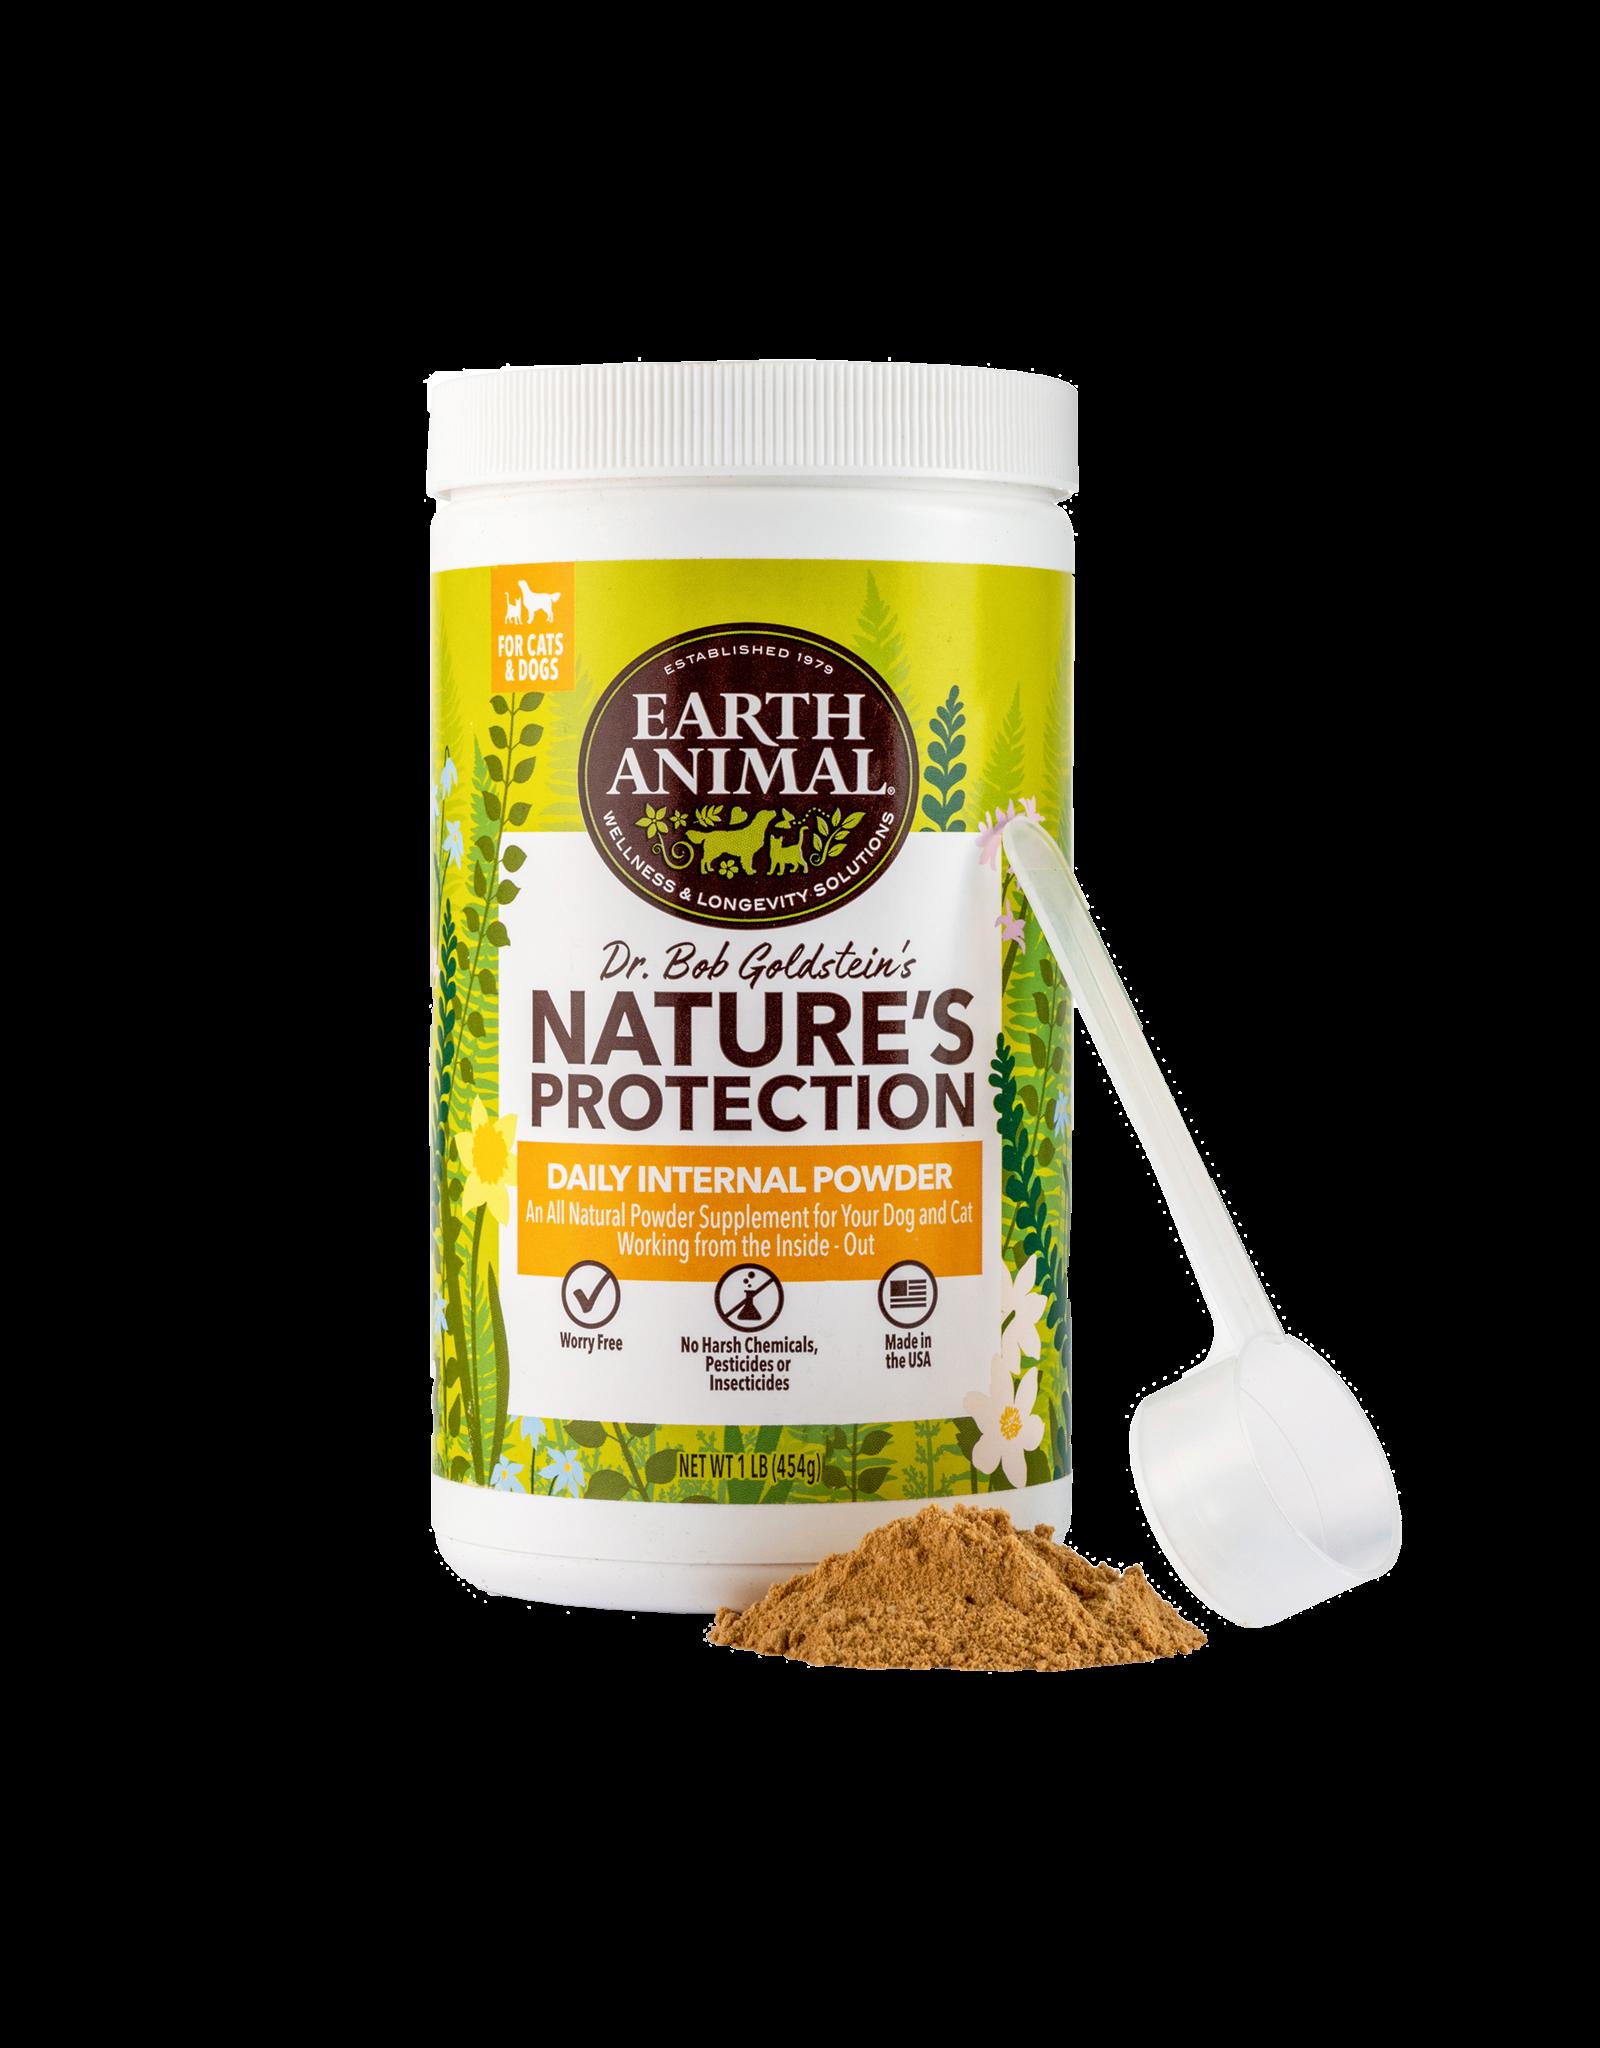 Earth Animal Nature's Protection: Daily Internal Powder, 1 lb